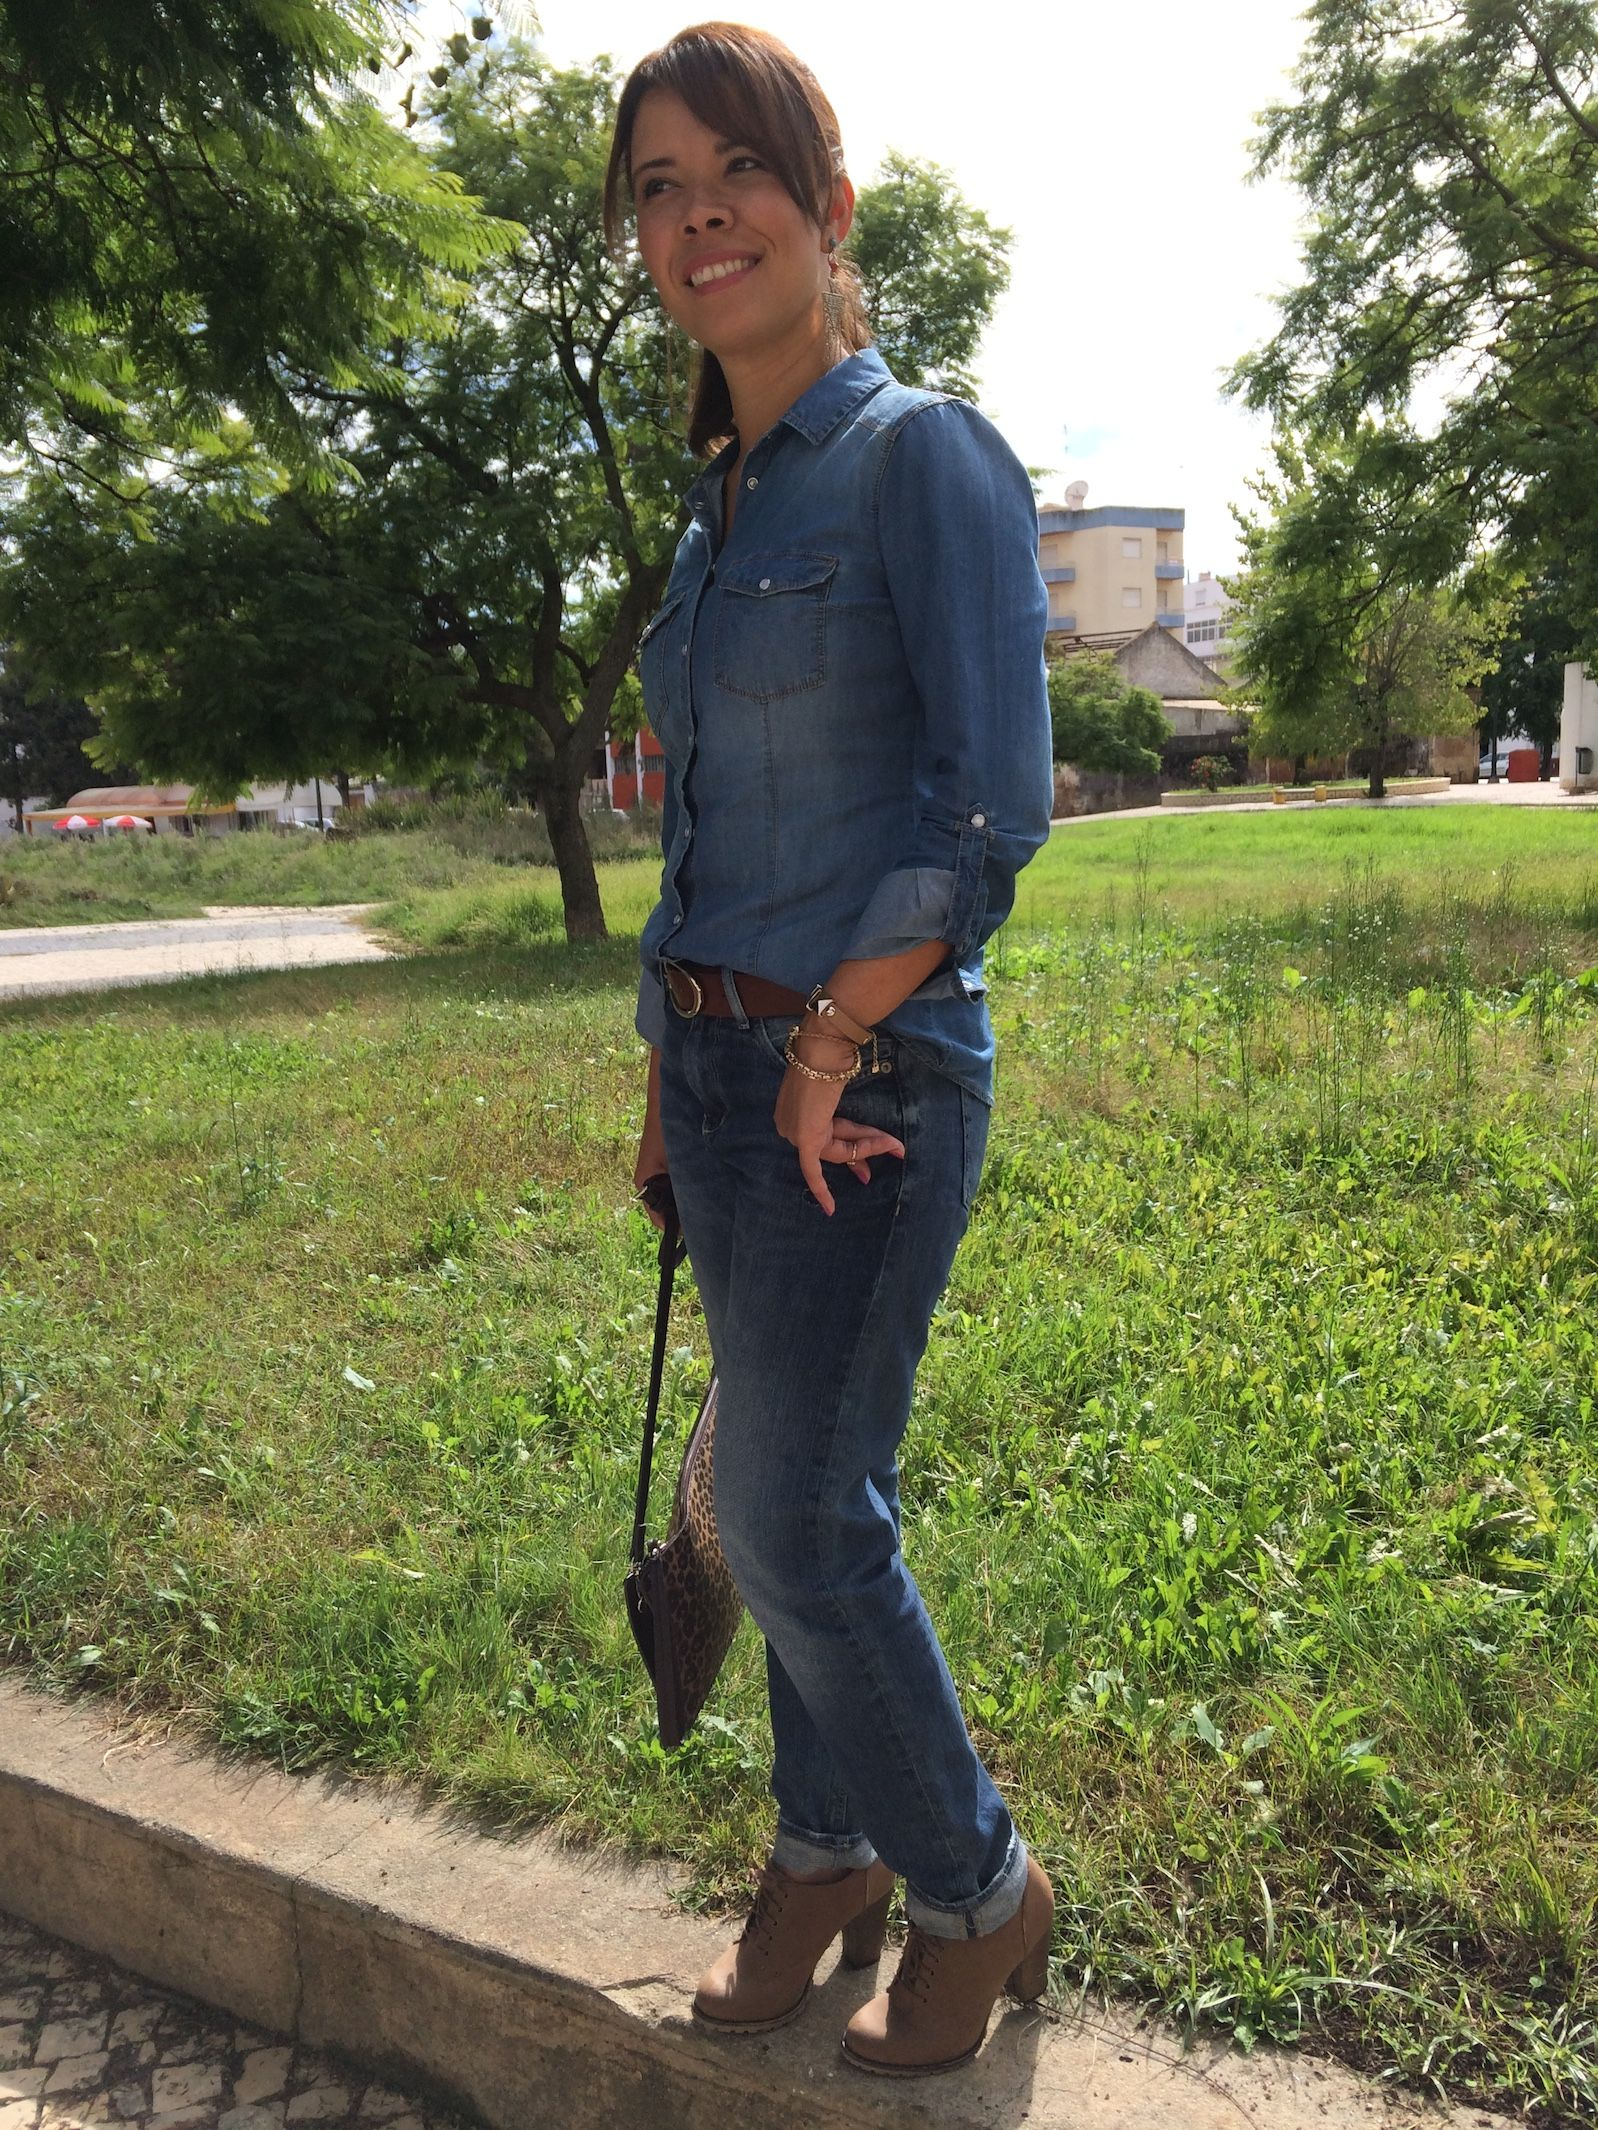 Boyfriend jeans with denim shirt and animal print bag